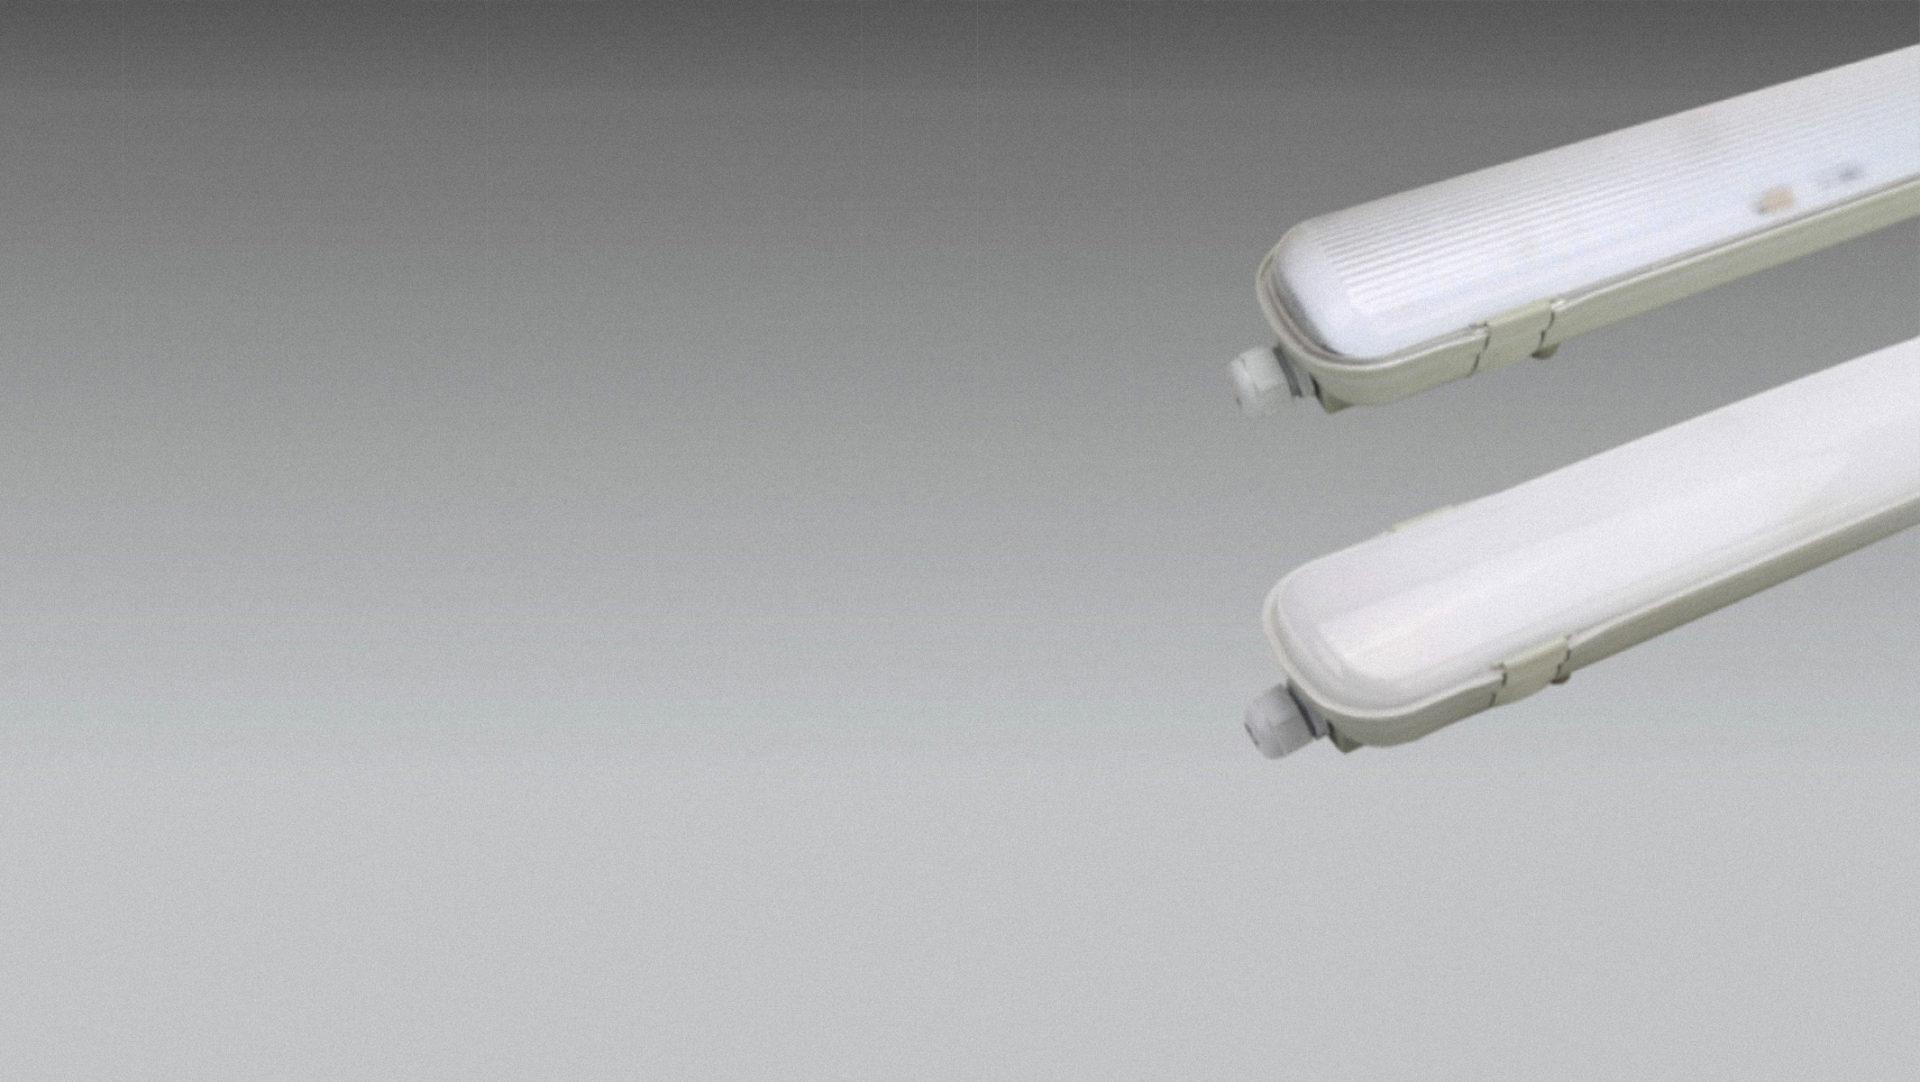 Plafoniere Ip65 : Plafoniera stagna led con tubi powersave solutions